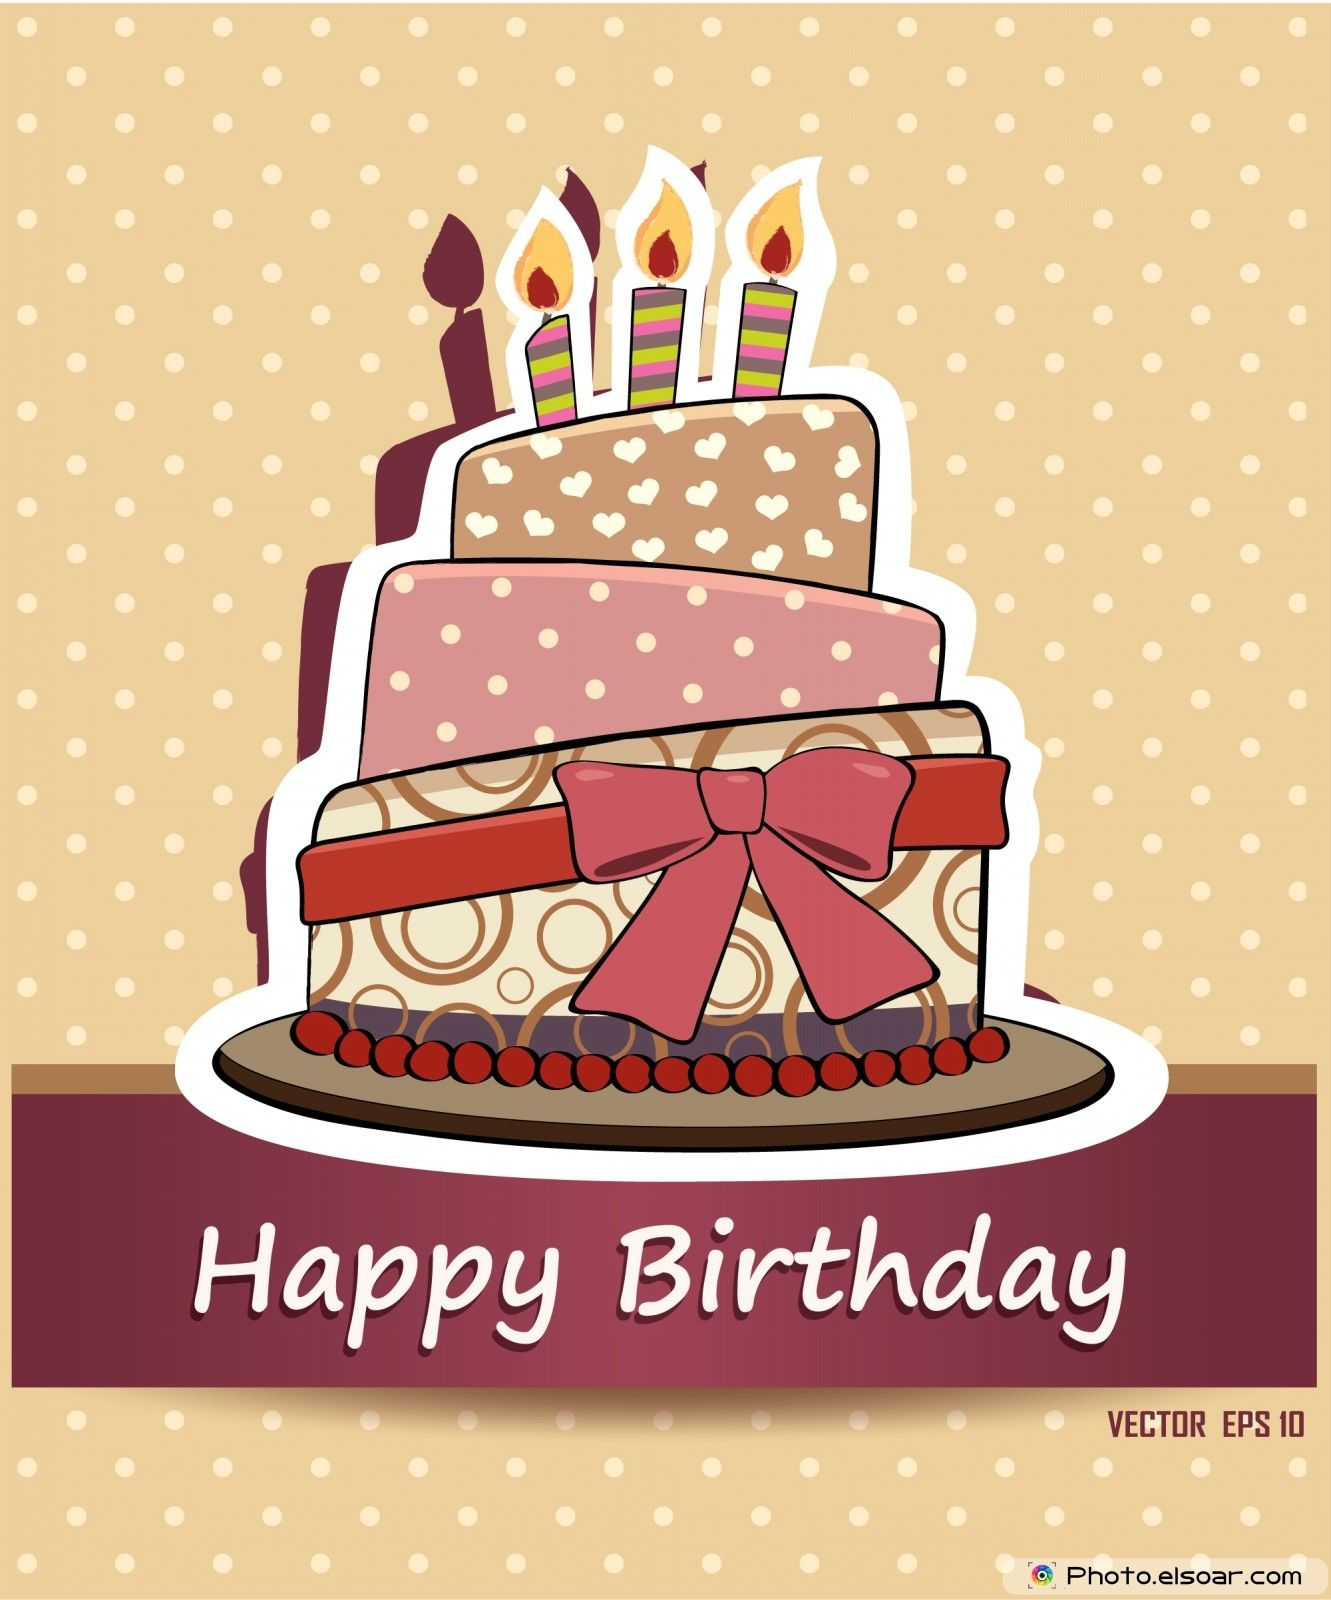 Happy birthday card Birthday cake Birthday Posters